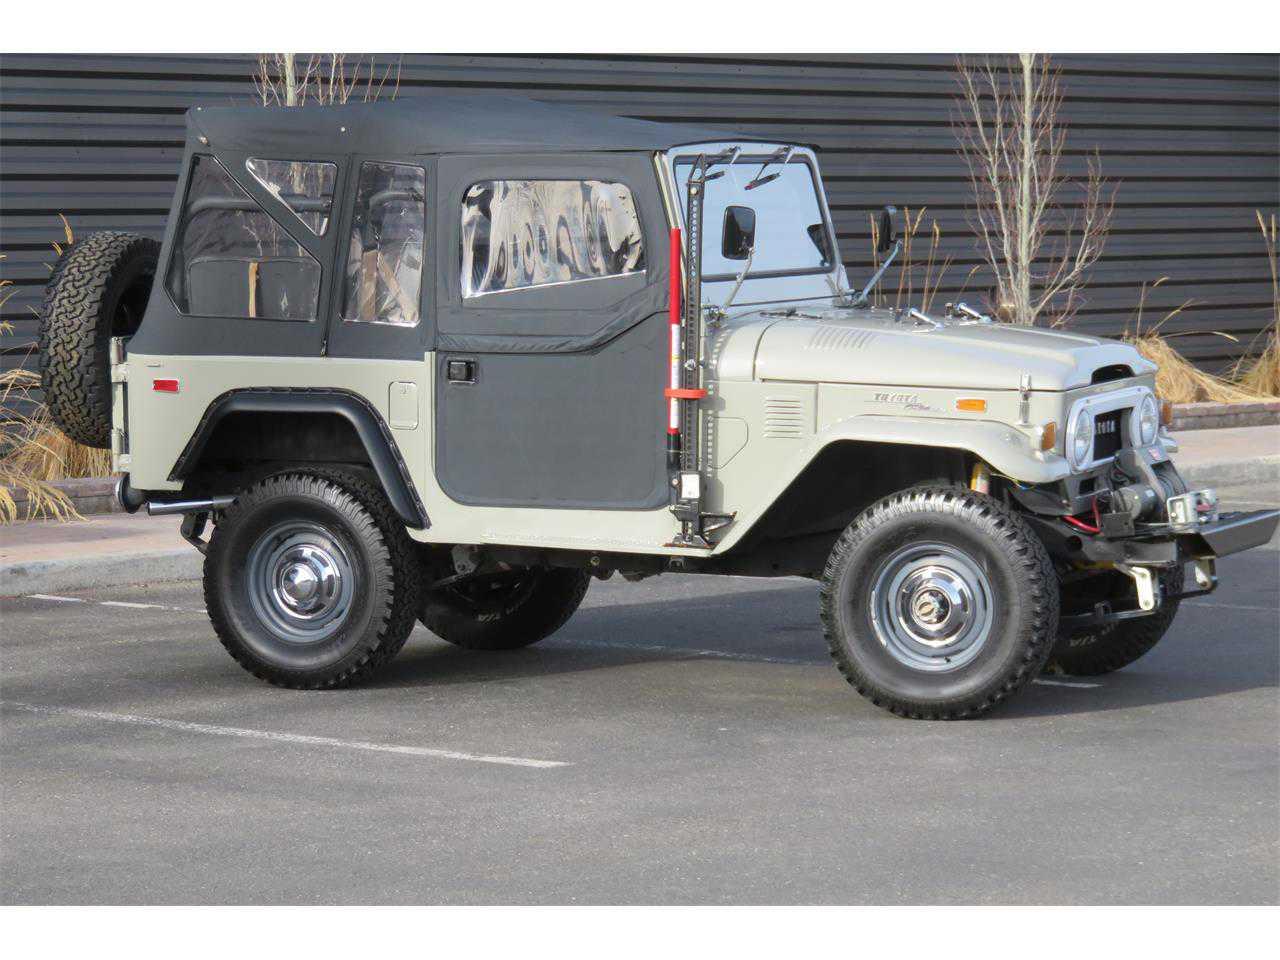 1973 Toyota Land Cruiser Fj For Sale In Hailey Id Fj401438812